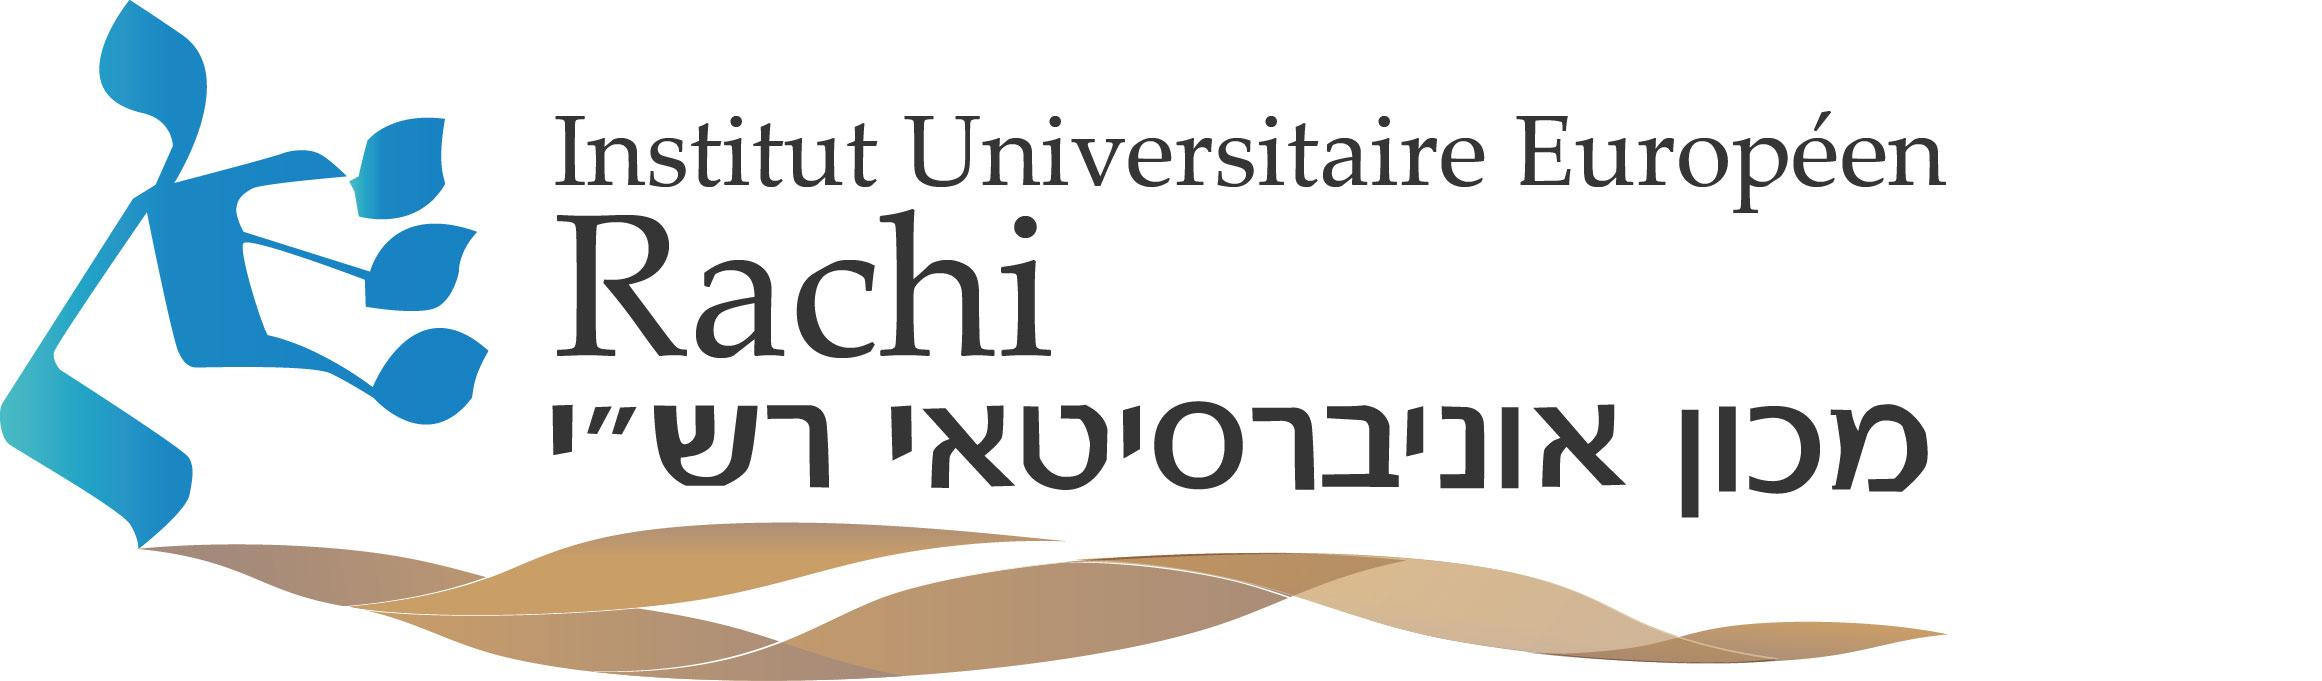 Institut Universitaire Européen Rachi